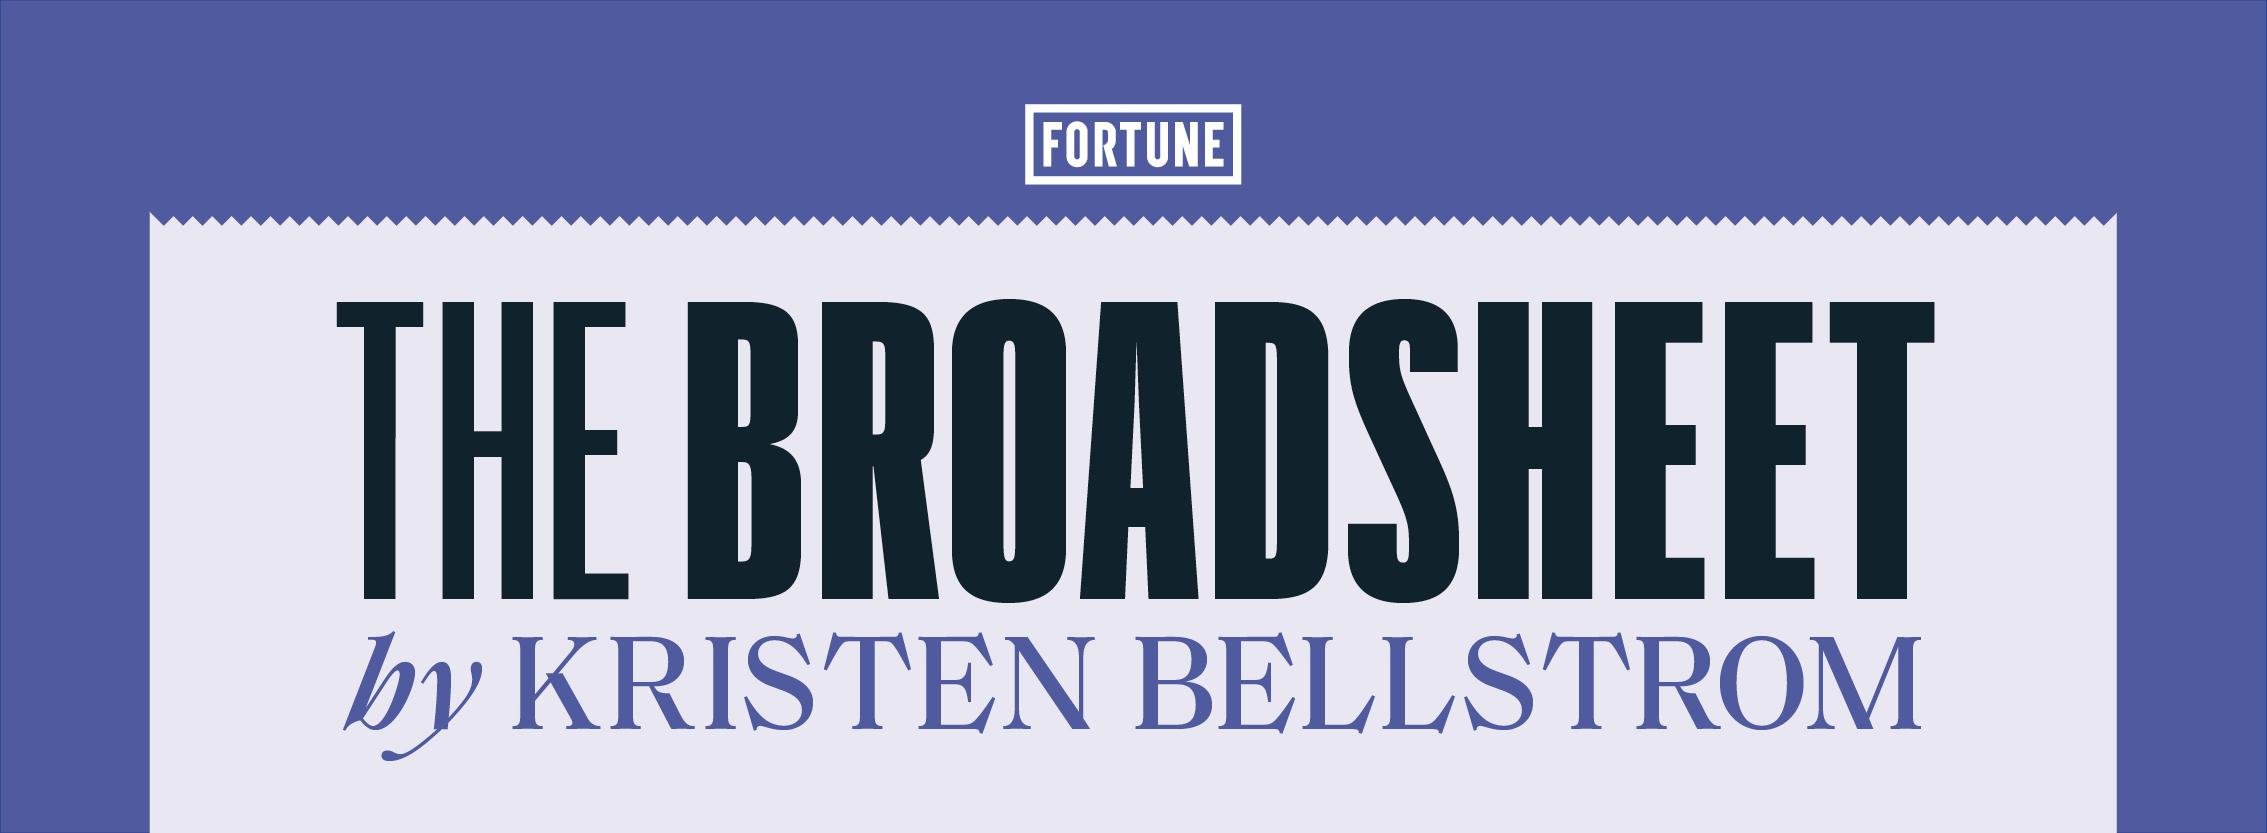 The Broadsheet